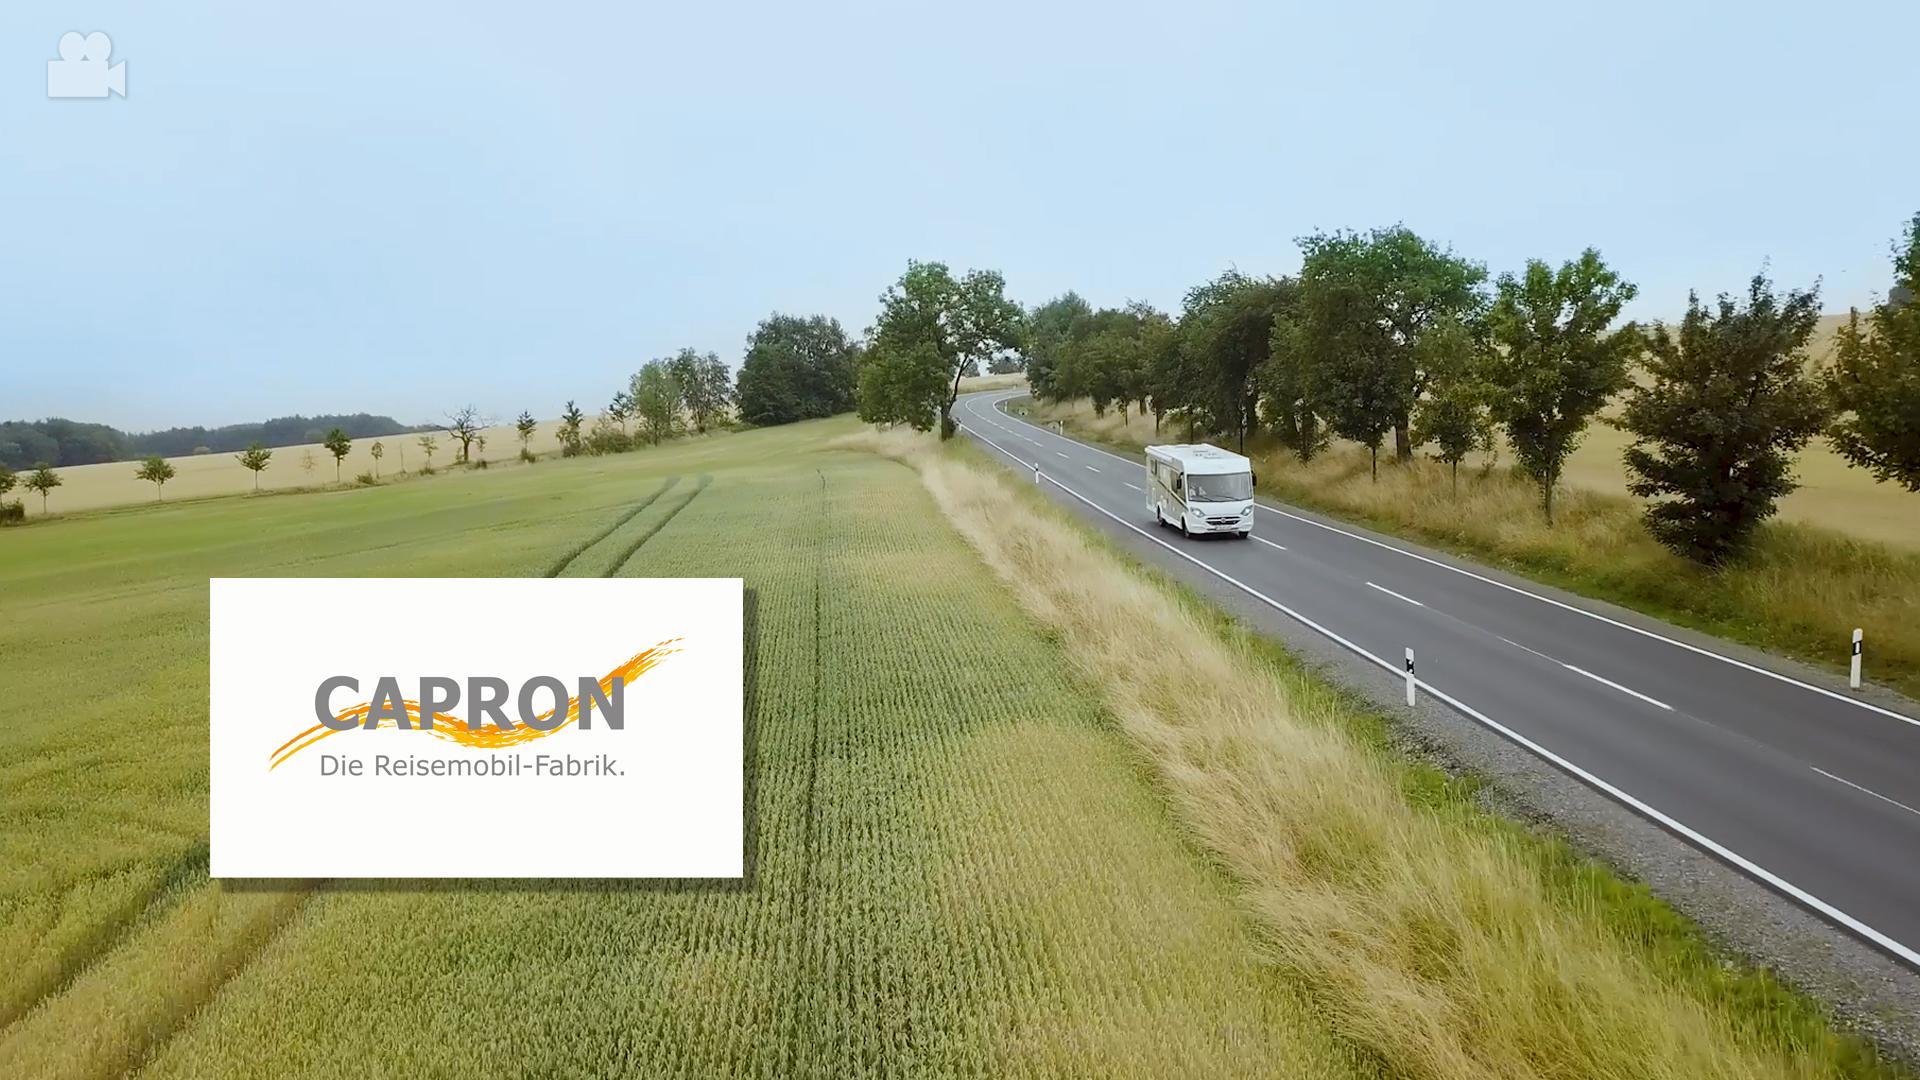 Capron GmbH Neustadt - Reisemobile aus Sachsen - Startseite